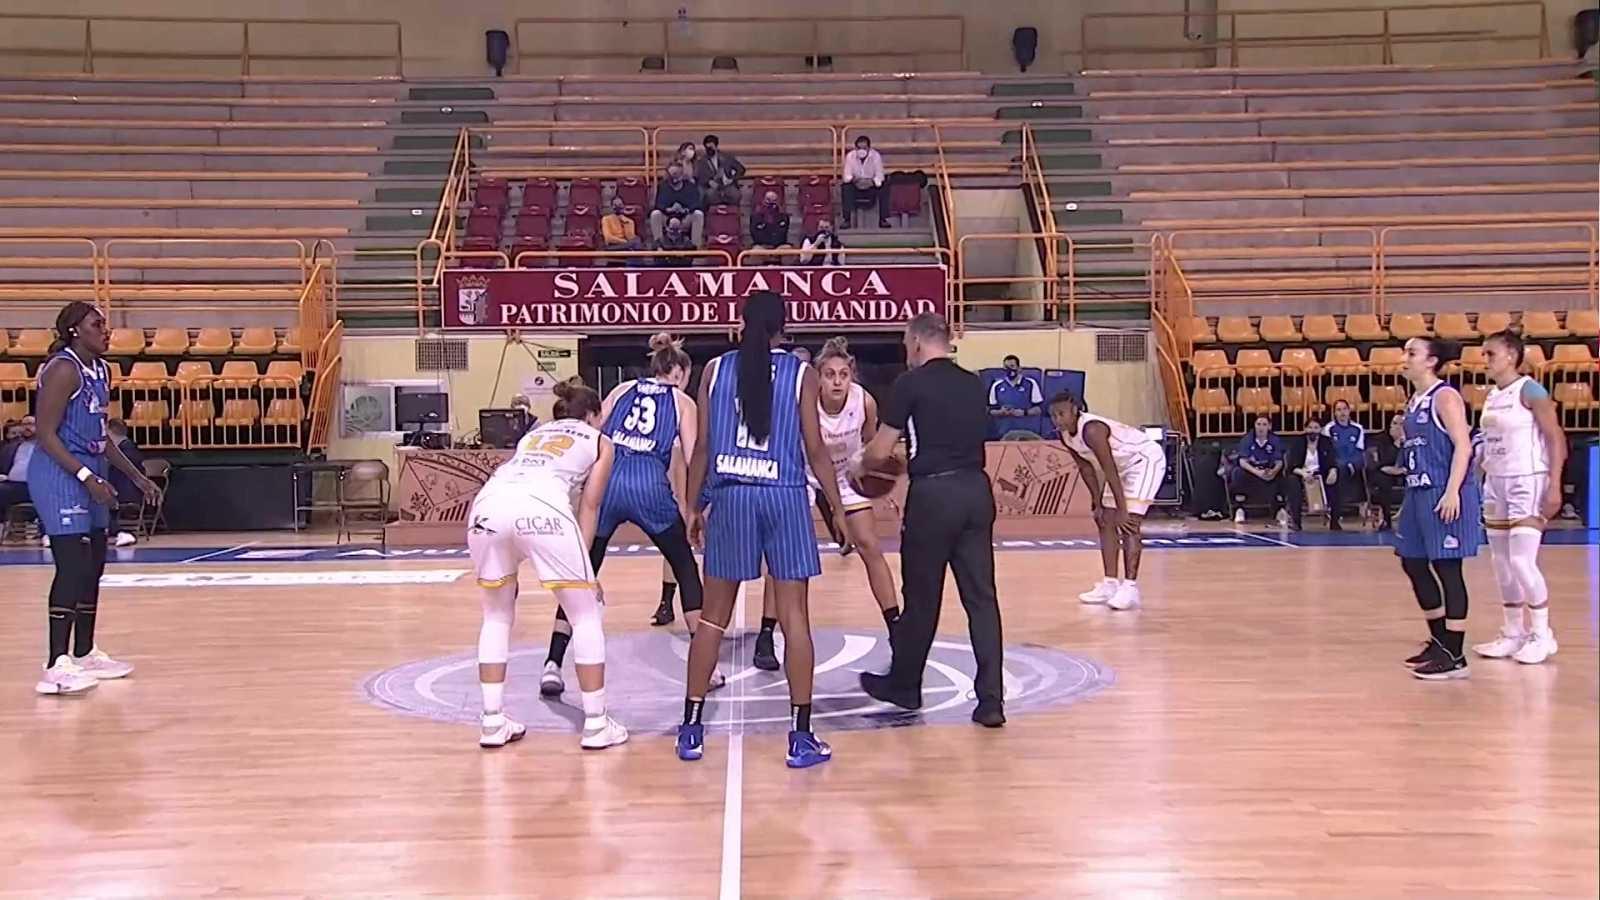 Baloncesto - Liga femenina Endesa. 27ª jornada: Perfumerías Avenida - Ciudad de La Laguna Tenerife - ver ahora